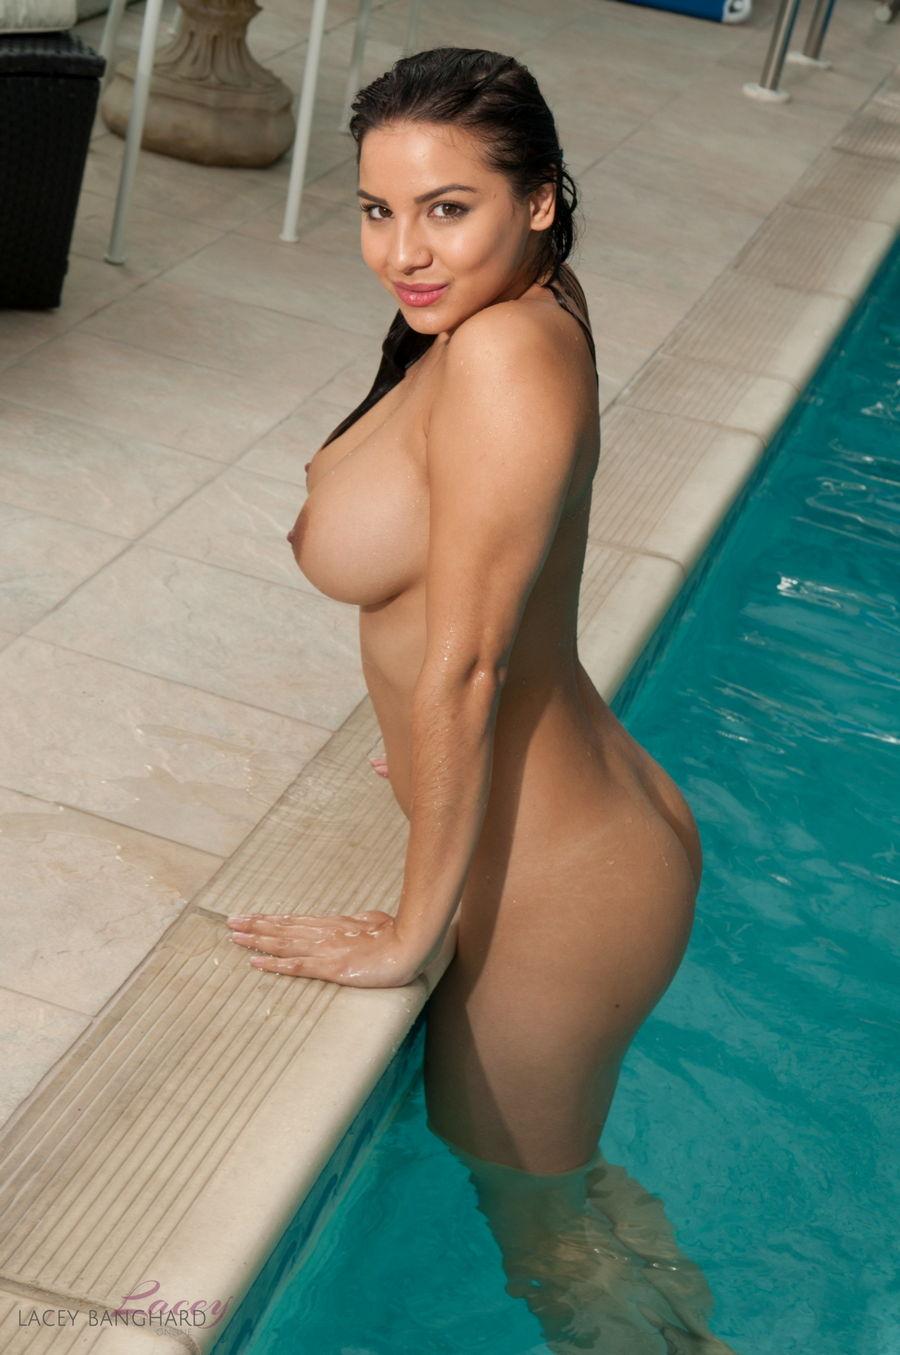 Lacey banghard nude